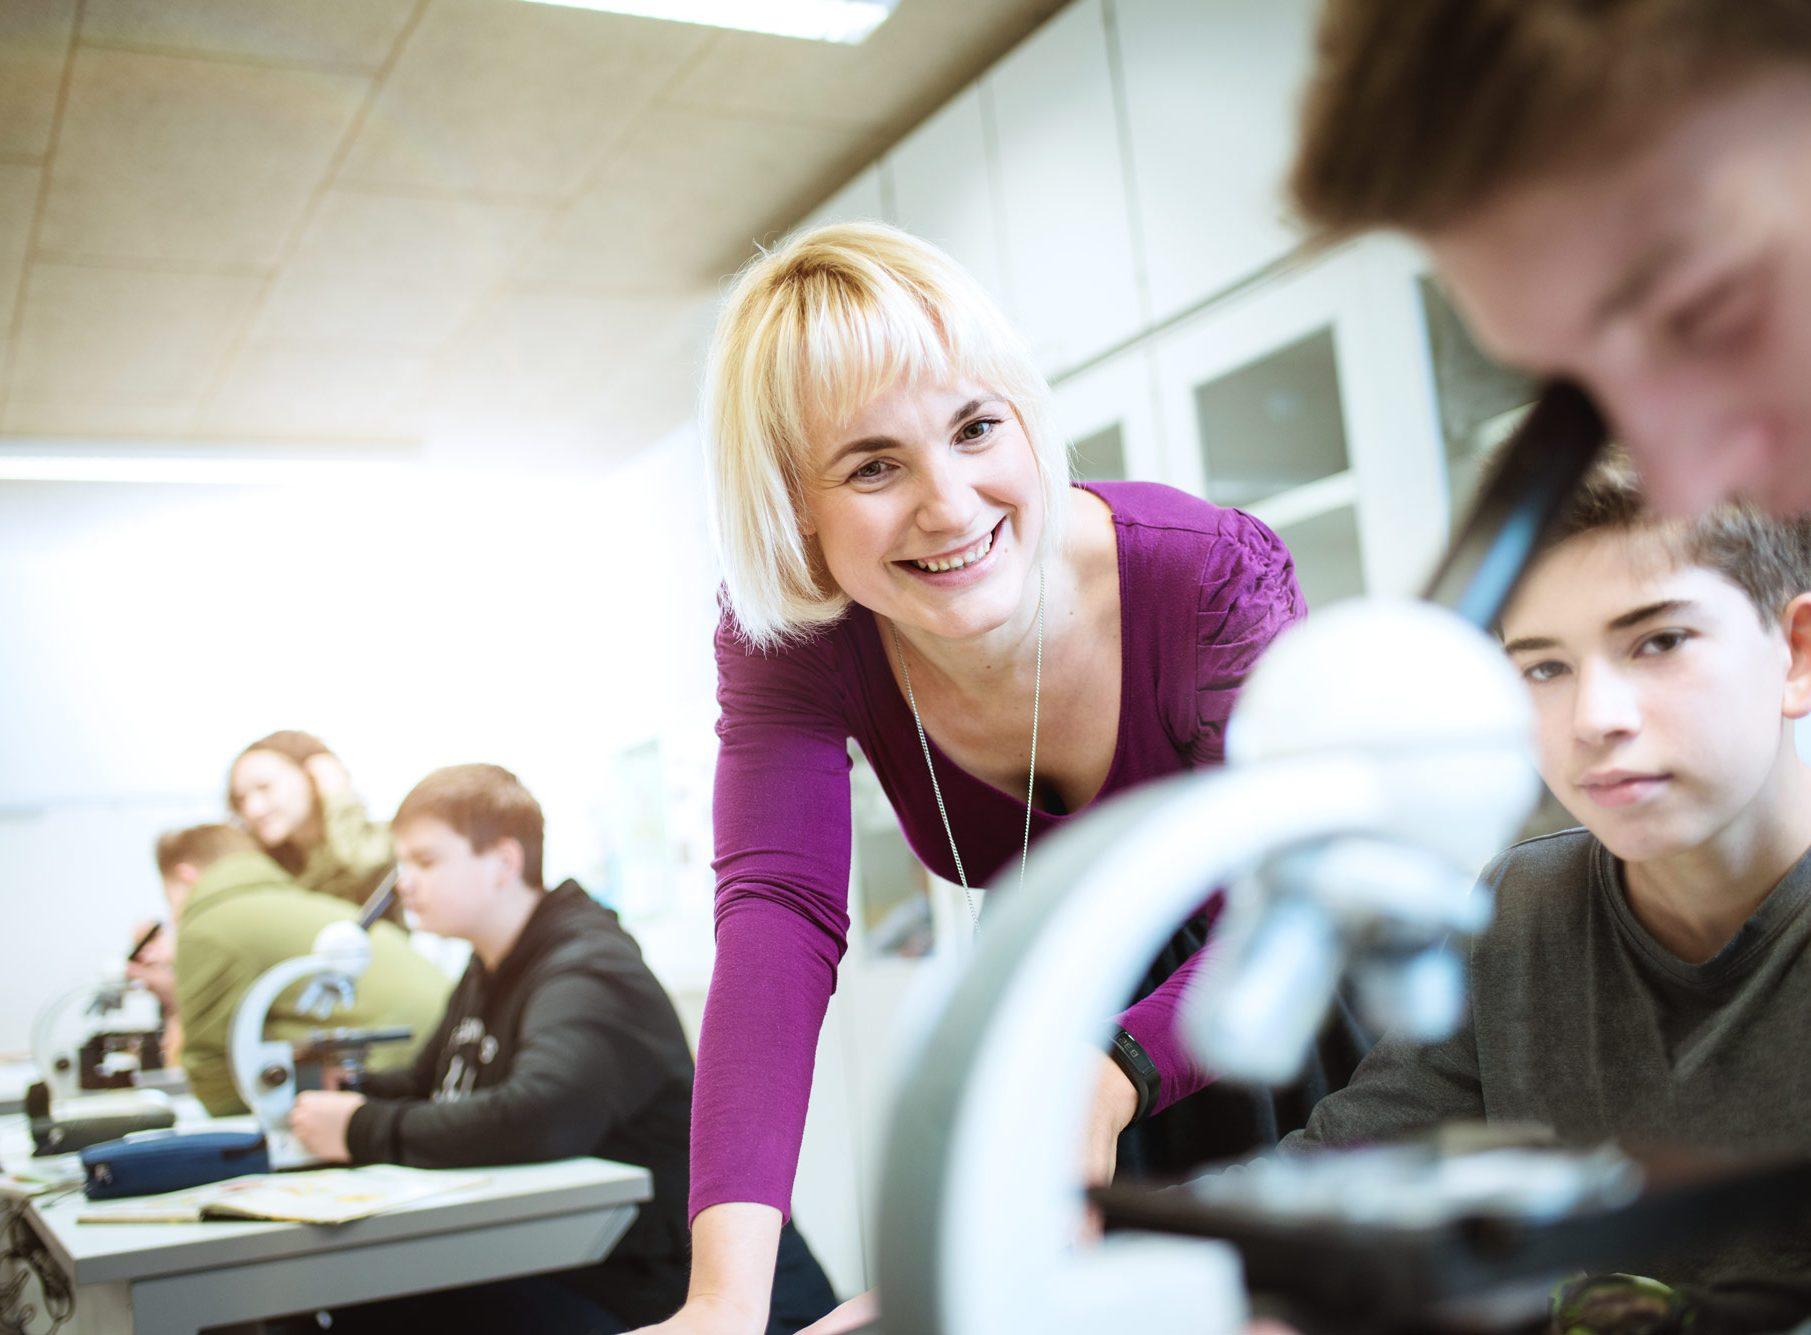 Evangelische-Schulstiftung-Mitteldeutschland-Employer-Branding-Campaign-People-in-School-01